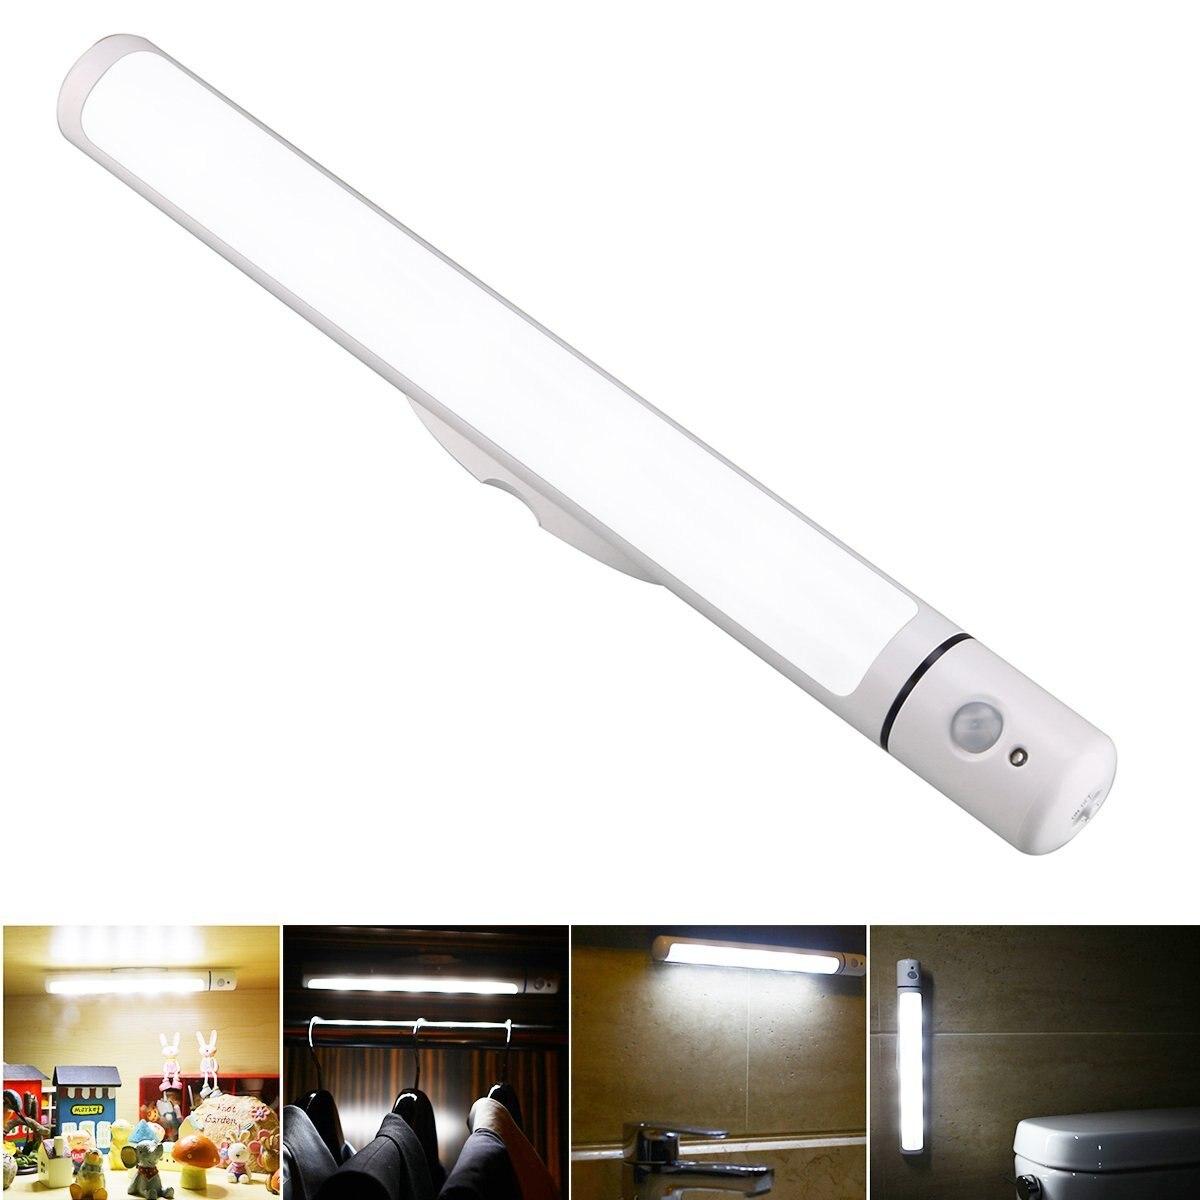 Awesome Wireless Indoor Lighting Photos - Interior Design Ideas ...